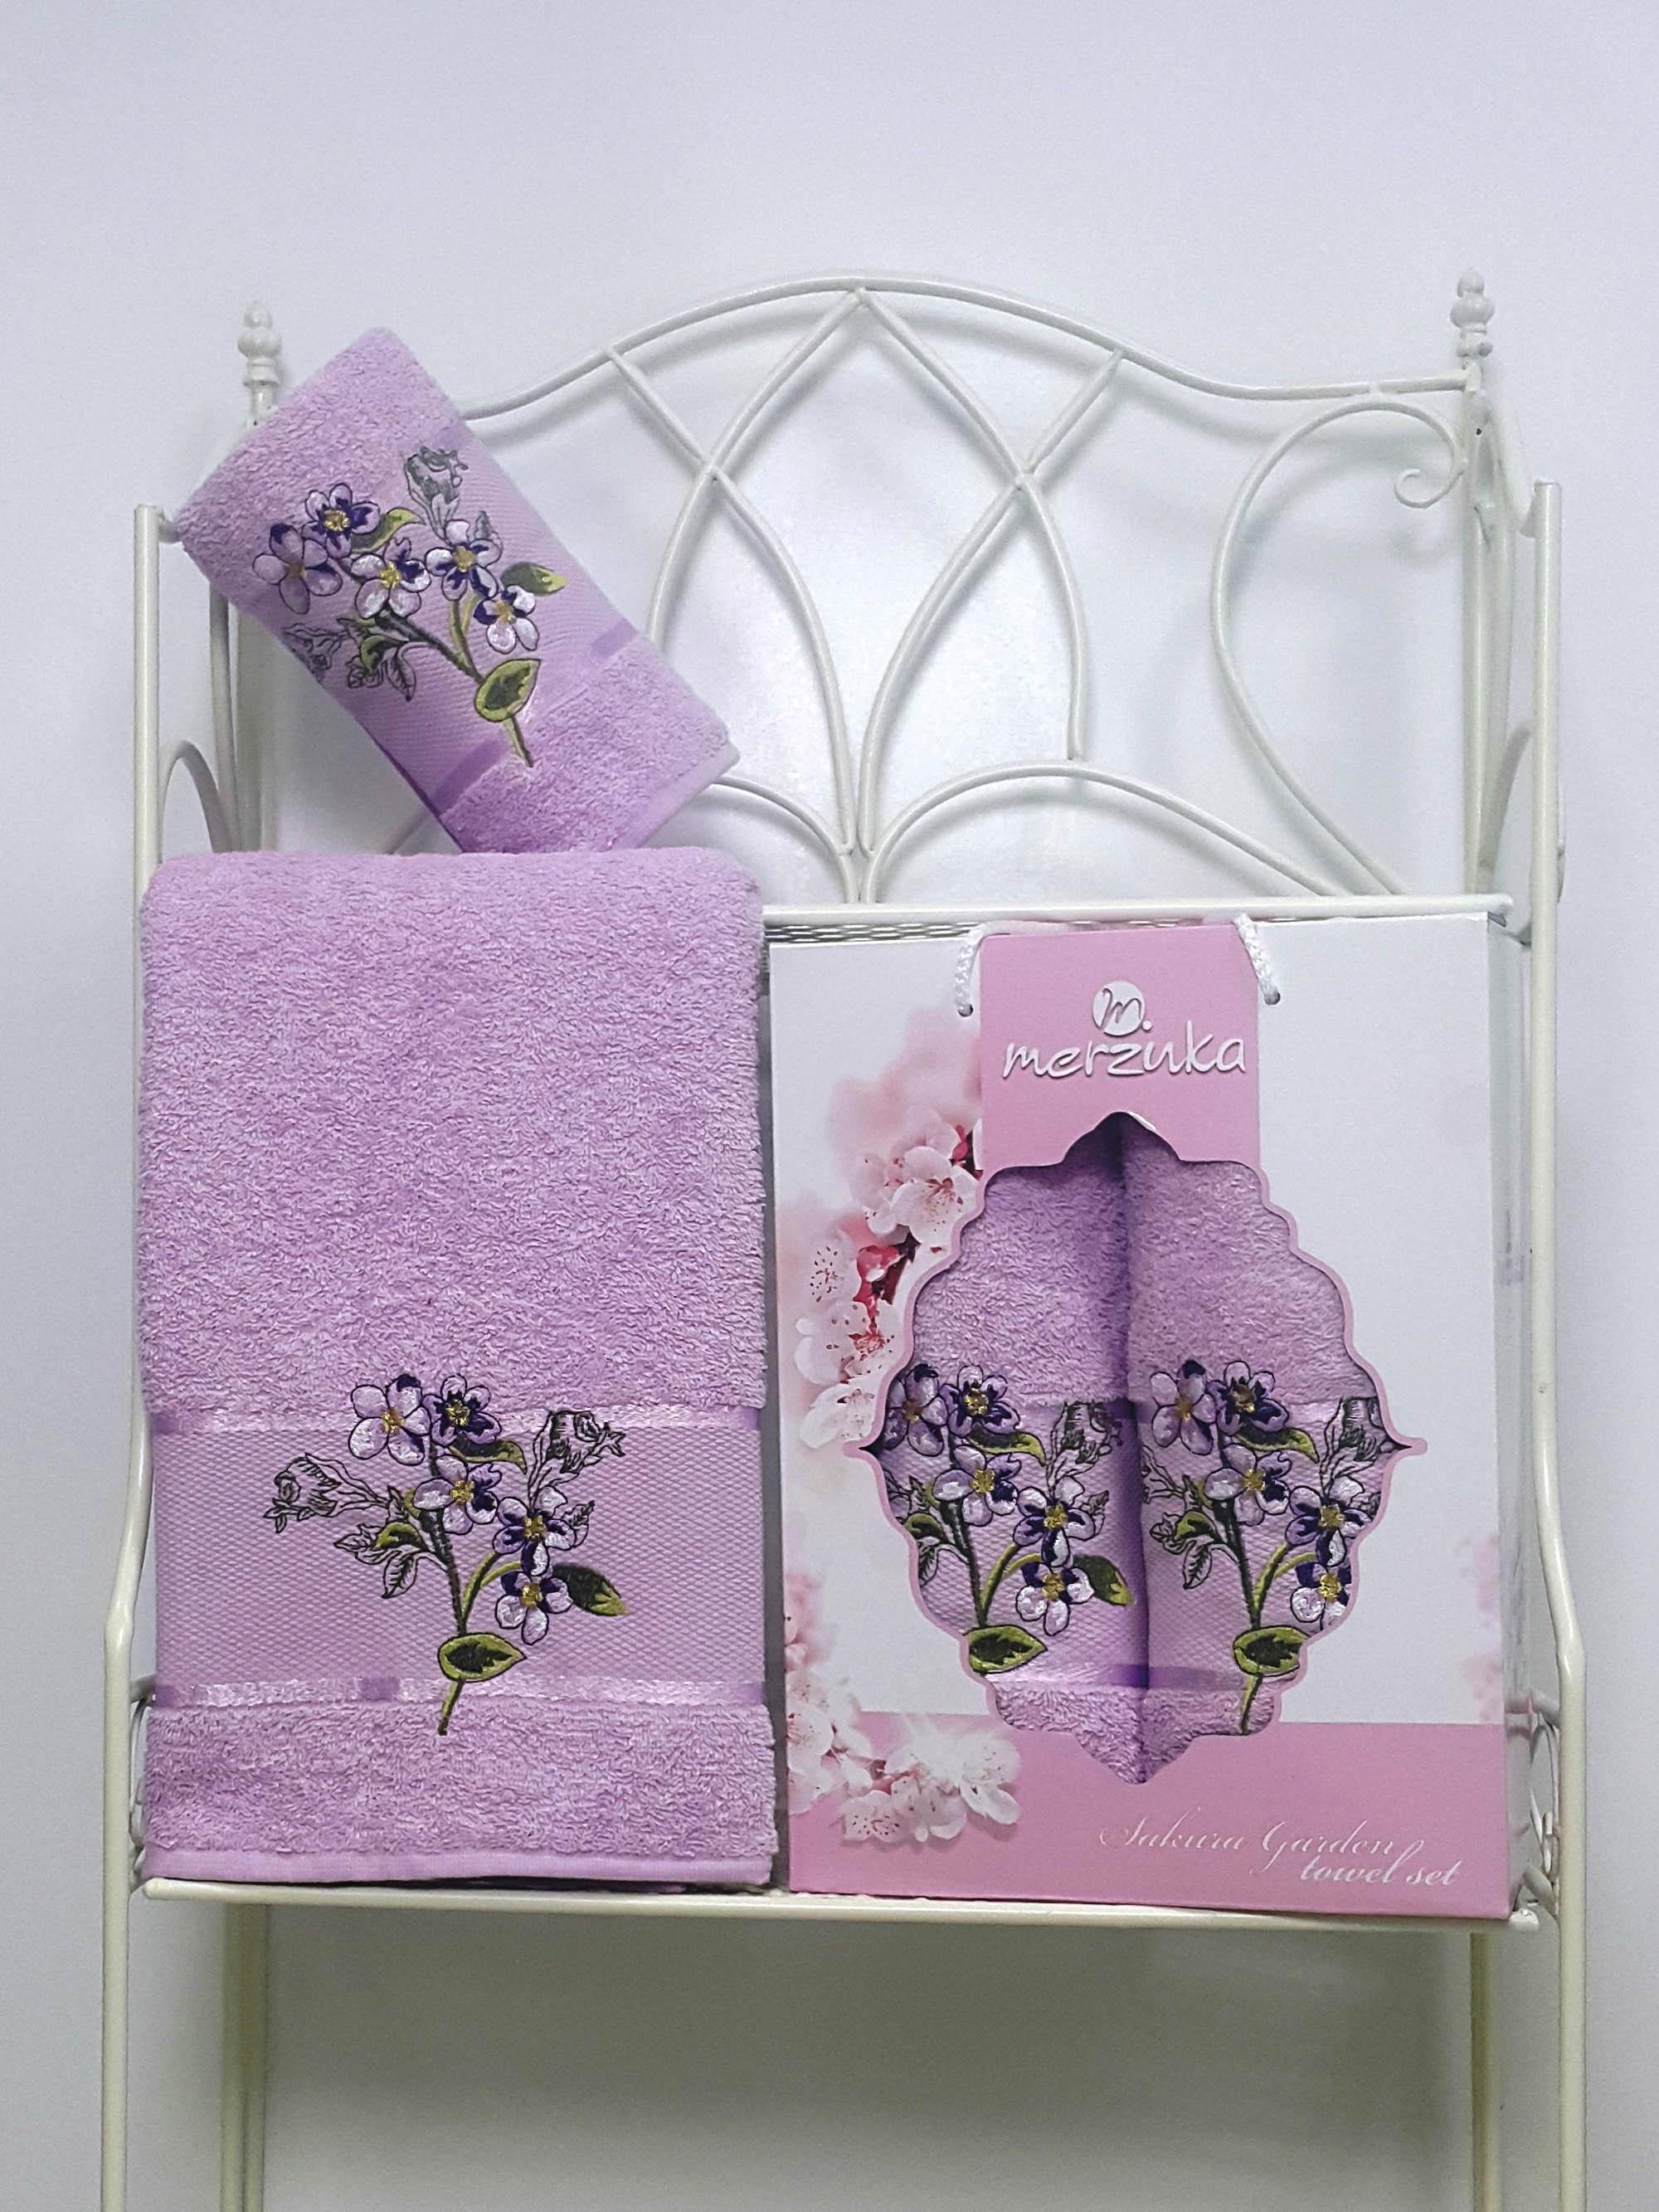 Полотенца Oran Merzuka Набор из 2 полотенец Sakura Garden Цвет: Сиреневый набор из 3 полотенец merzuka sakura 50х90 2 70х140 8432 оранжевый